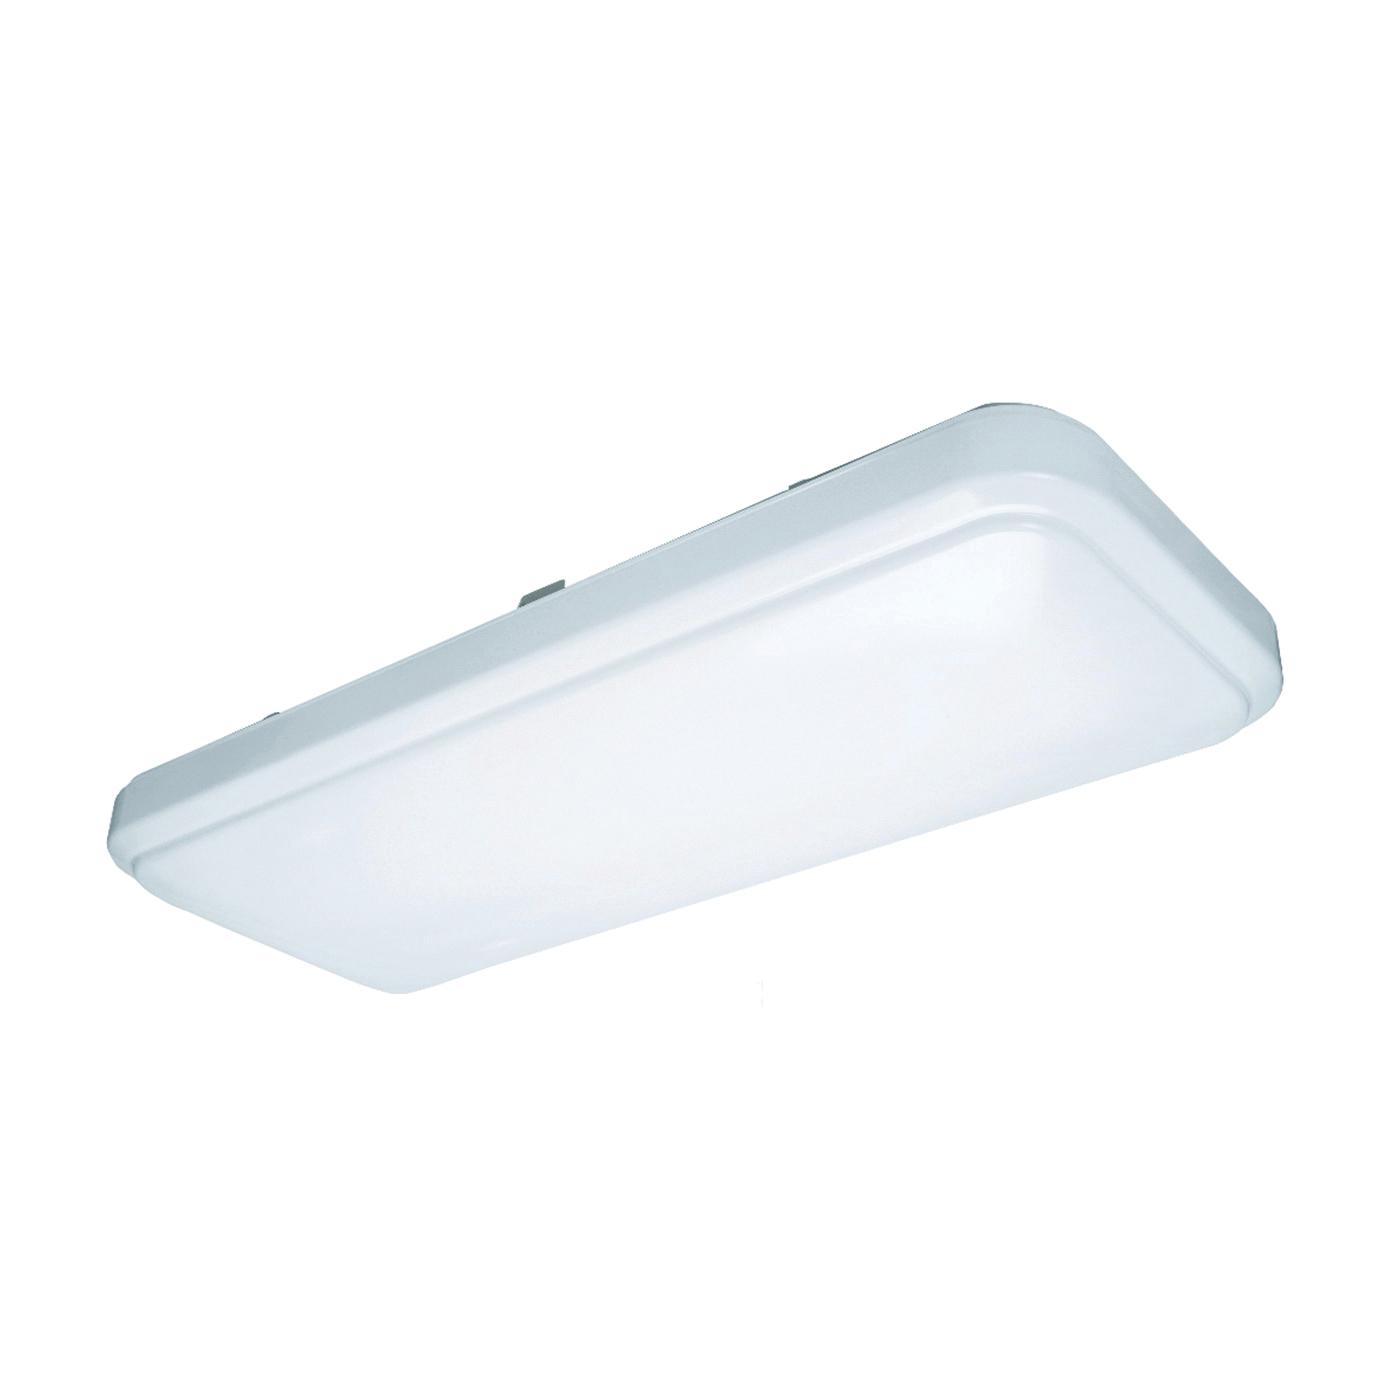 Picture of ETI 54647142 Ceiling Light, 120 VAC, 40 W, LED Lamp, 3000 Lumens, 4000 K Color Temp